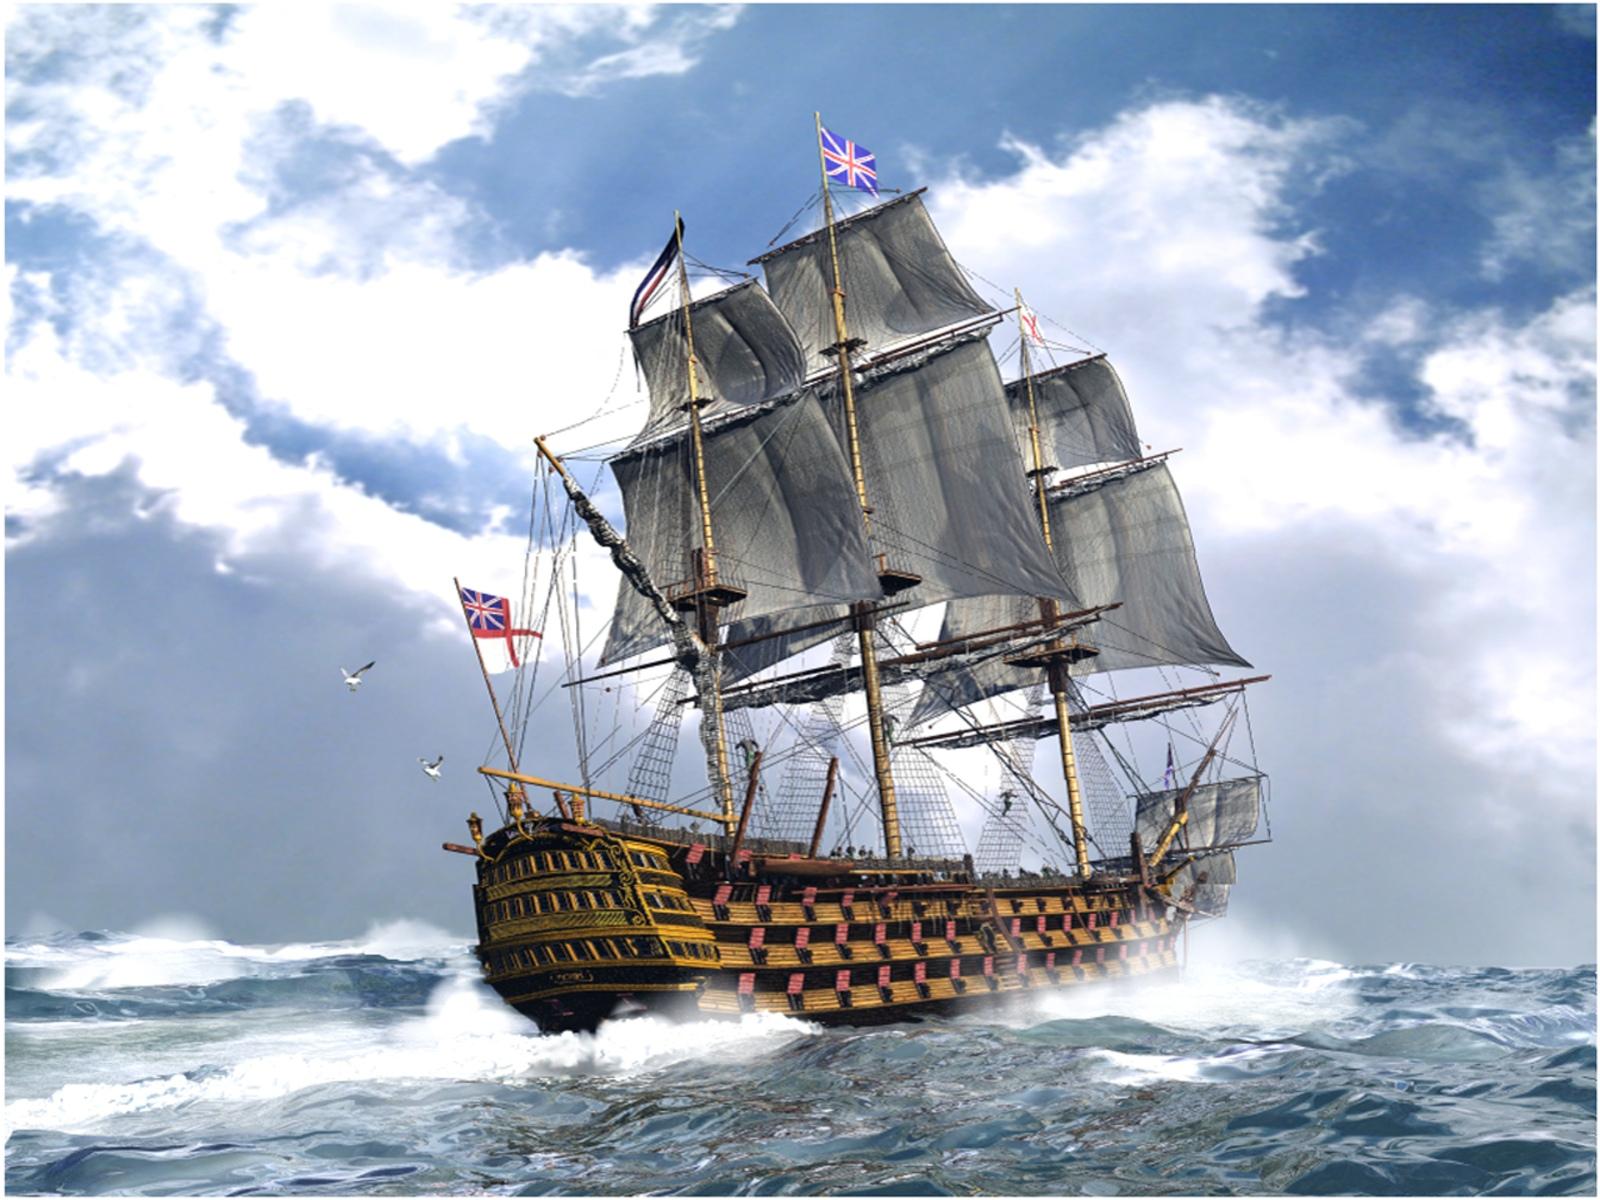 screen decoration: Free 3D Sailing Ship 1600 x 1200 Pixel ...